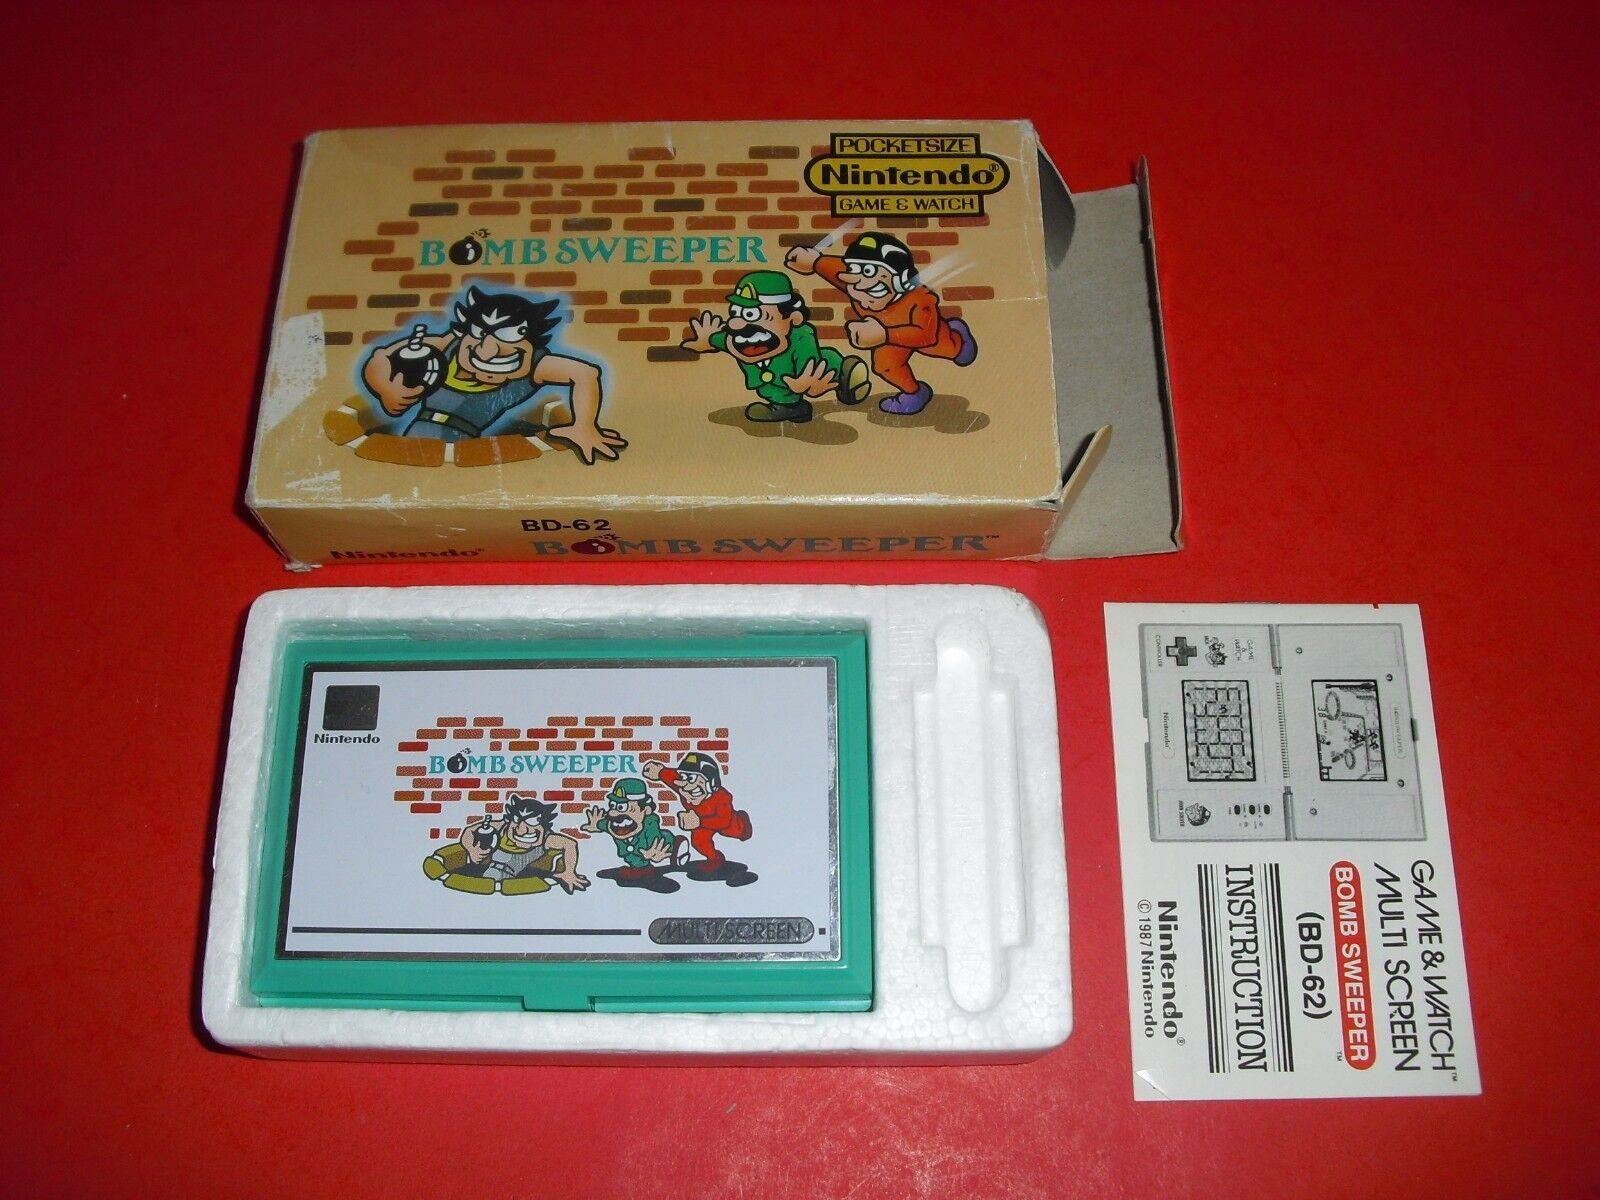 Vintage Handheld Nintendo Game Watch Bomb Sweeper Bd 62 1987 For Sale Online Ebay